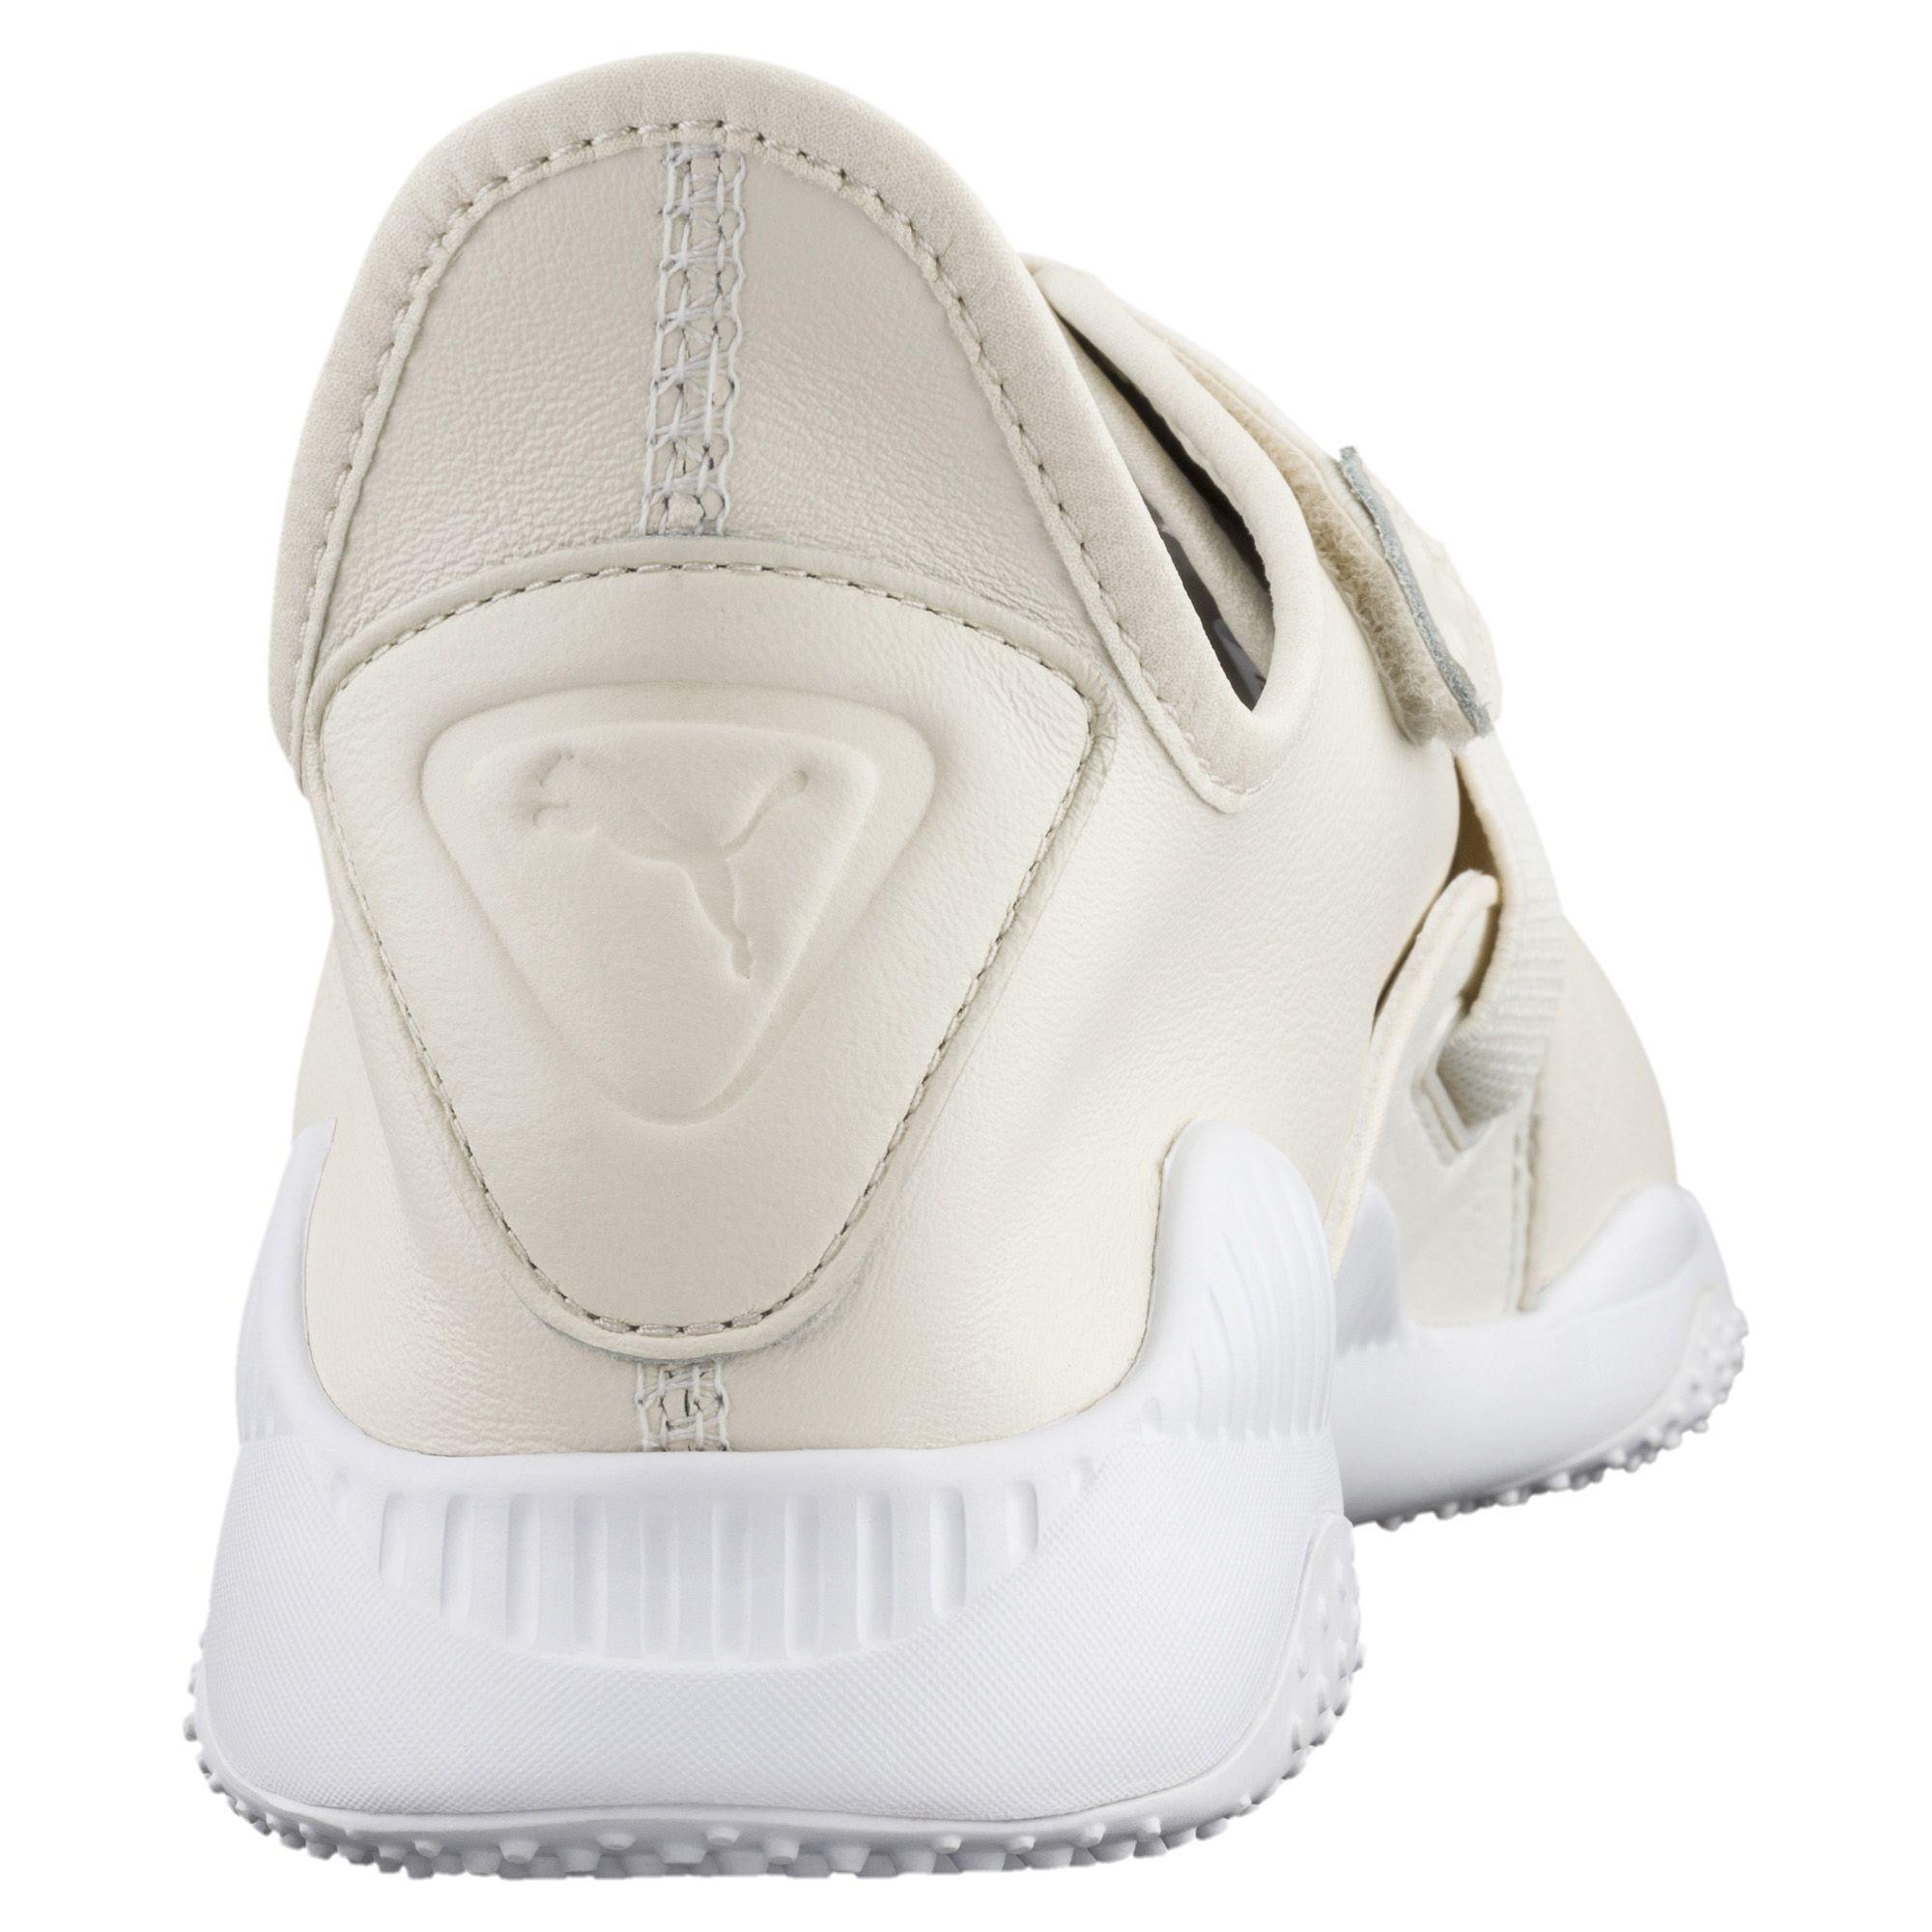 puma AVID Lux Sneakers bianca